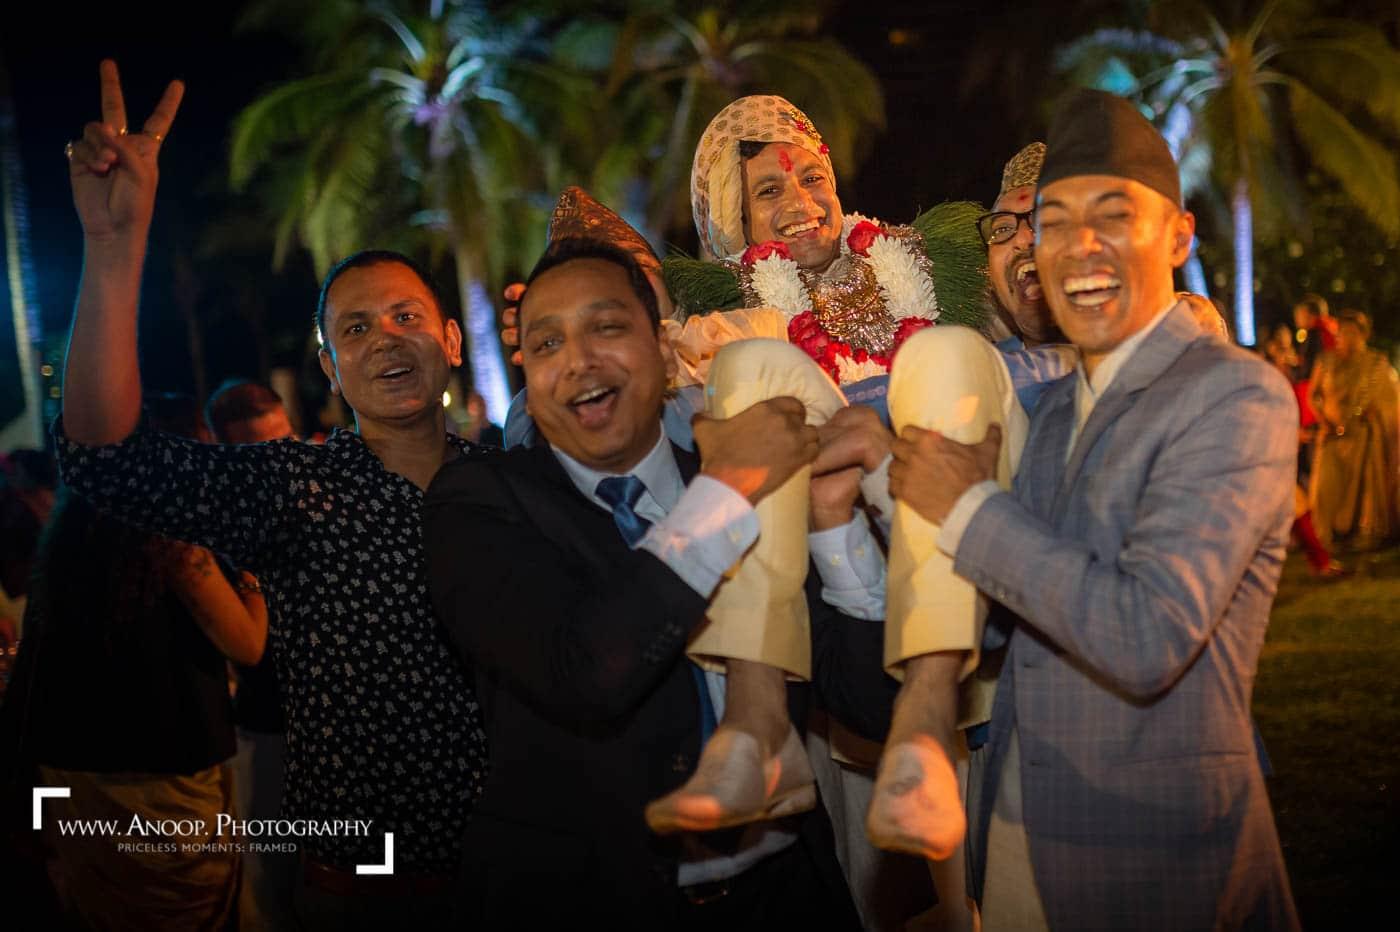 Destination-Nepali-Wedding-in-thailand-sheraton-hua-hin-020